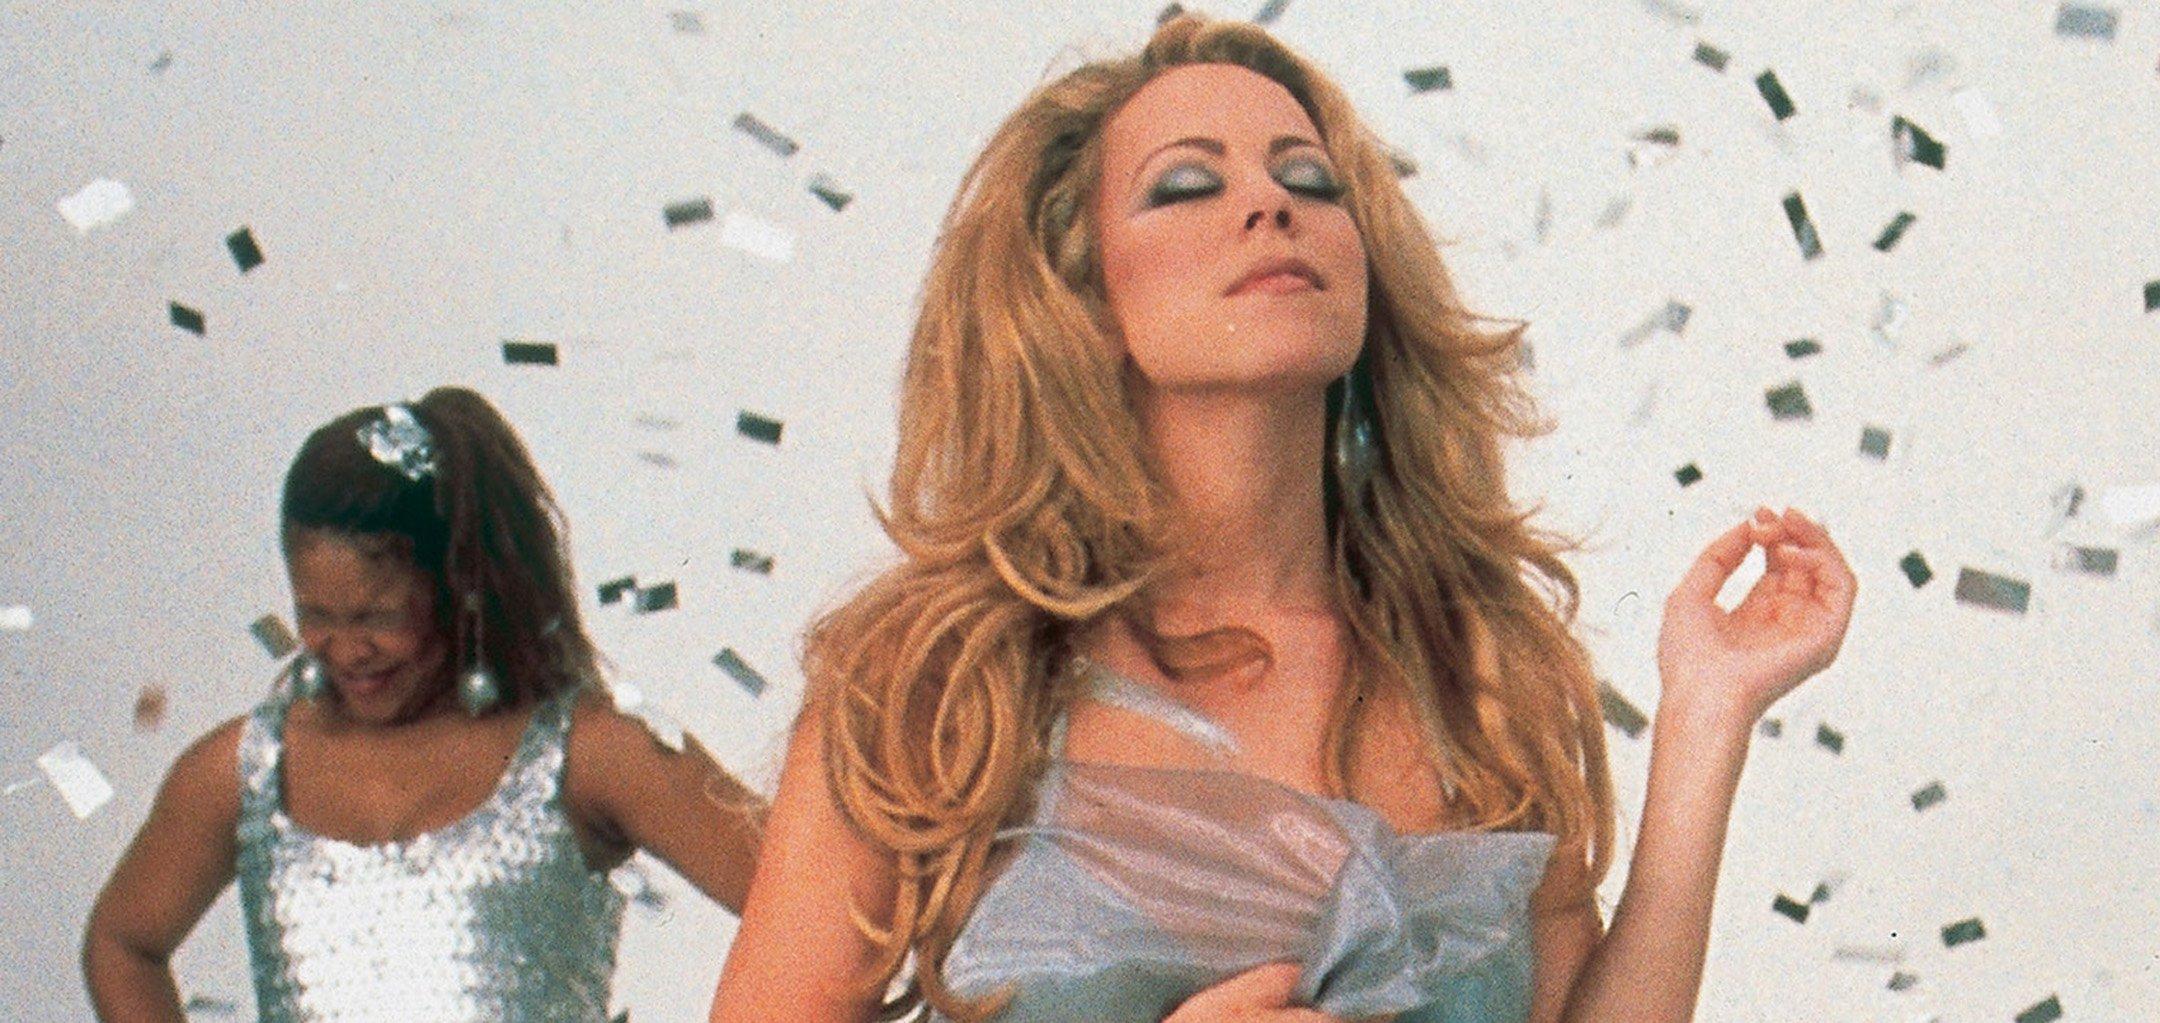 Mariah Carey in a promo shot from 'Glitter' (2001)